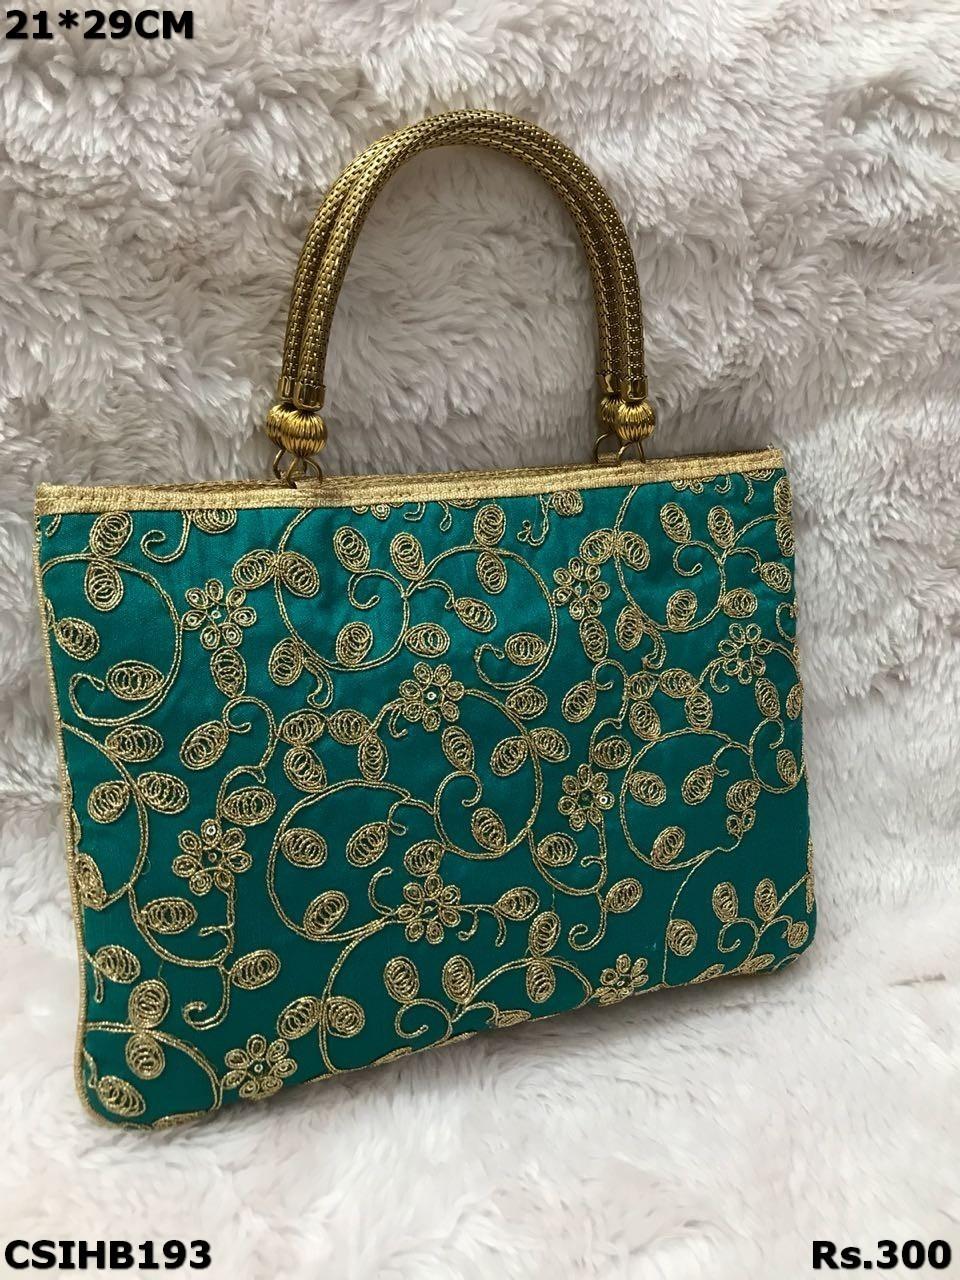 Embroidered Handbags